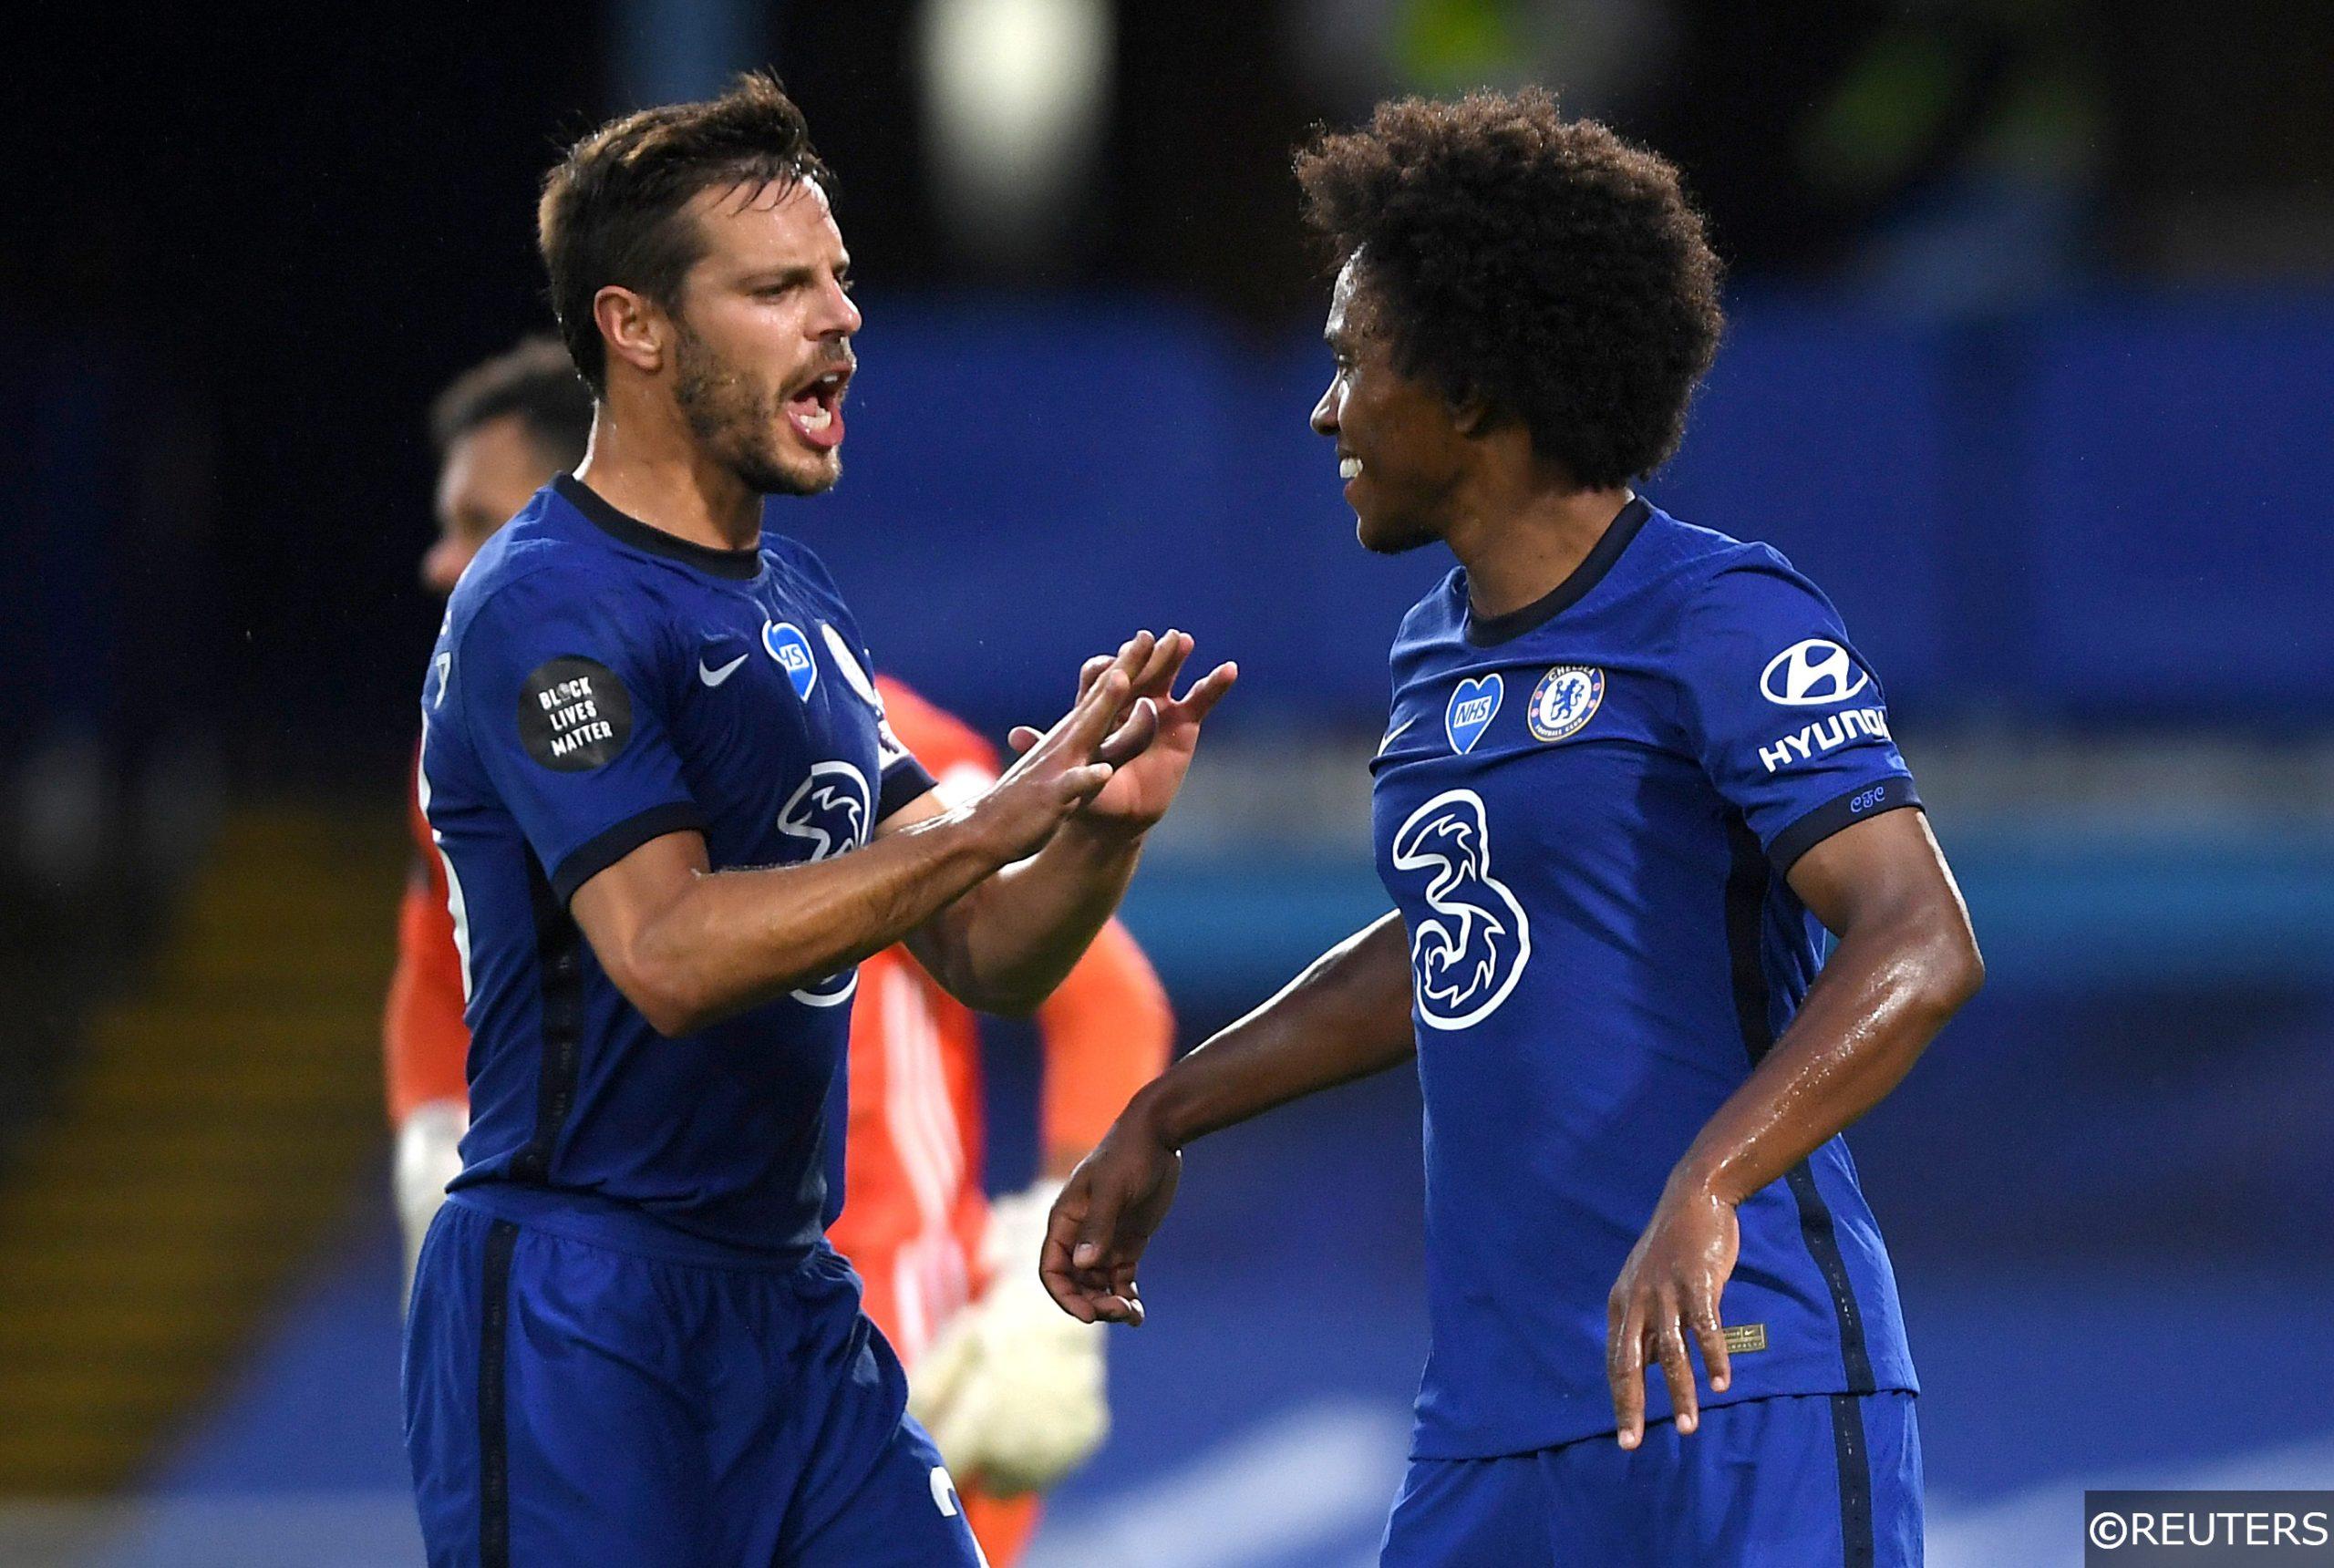 Chelsea defender Azpilicueta and forward Willian